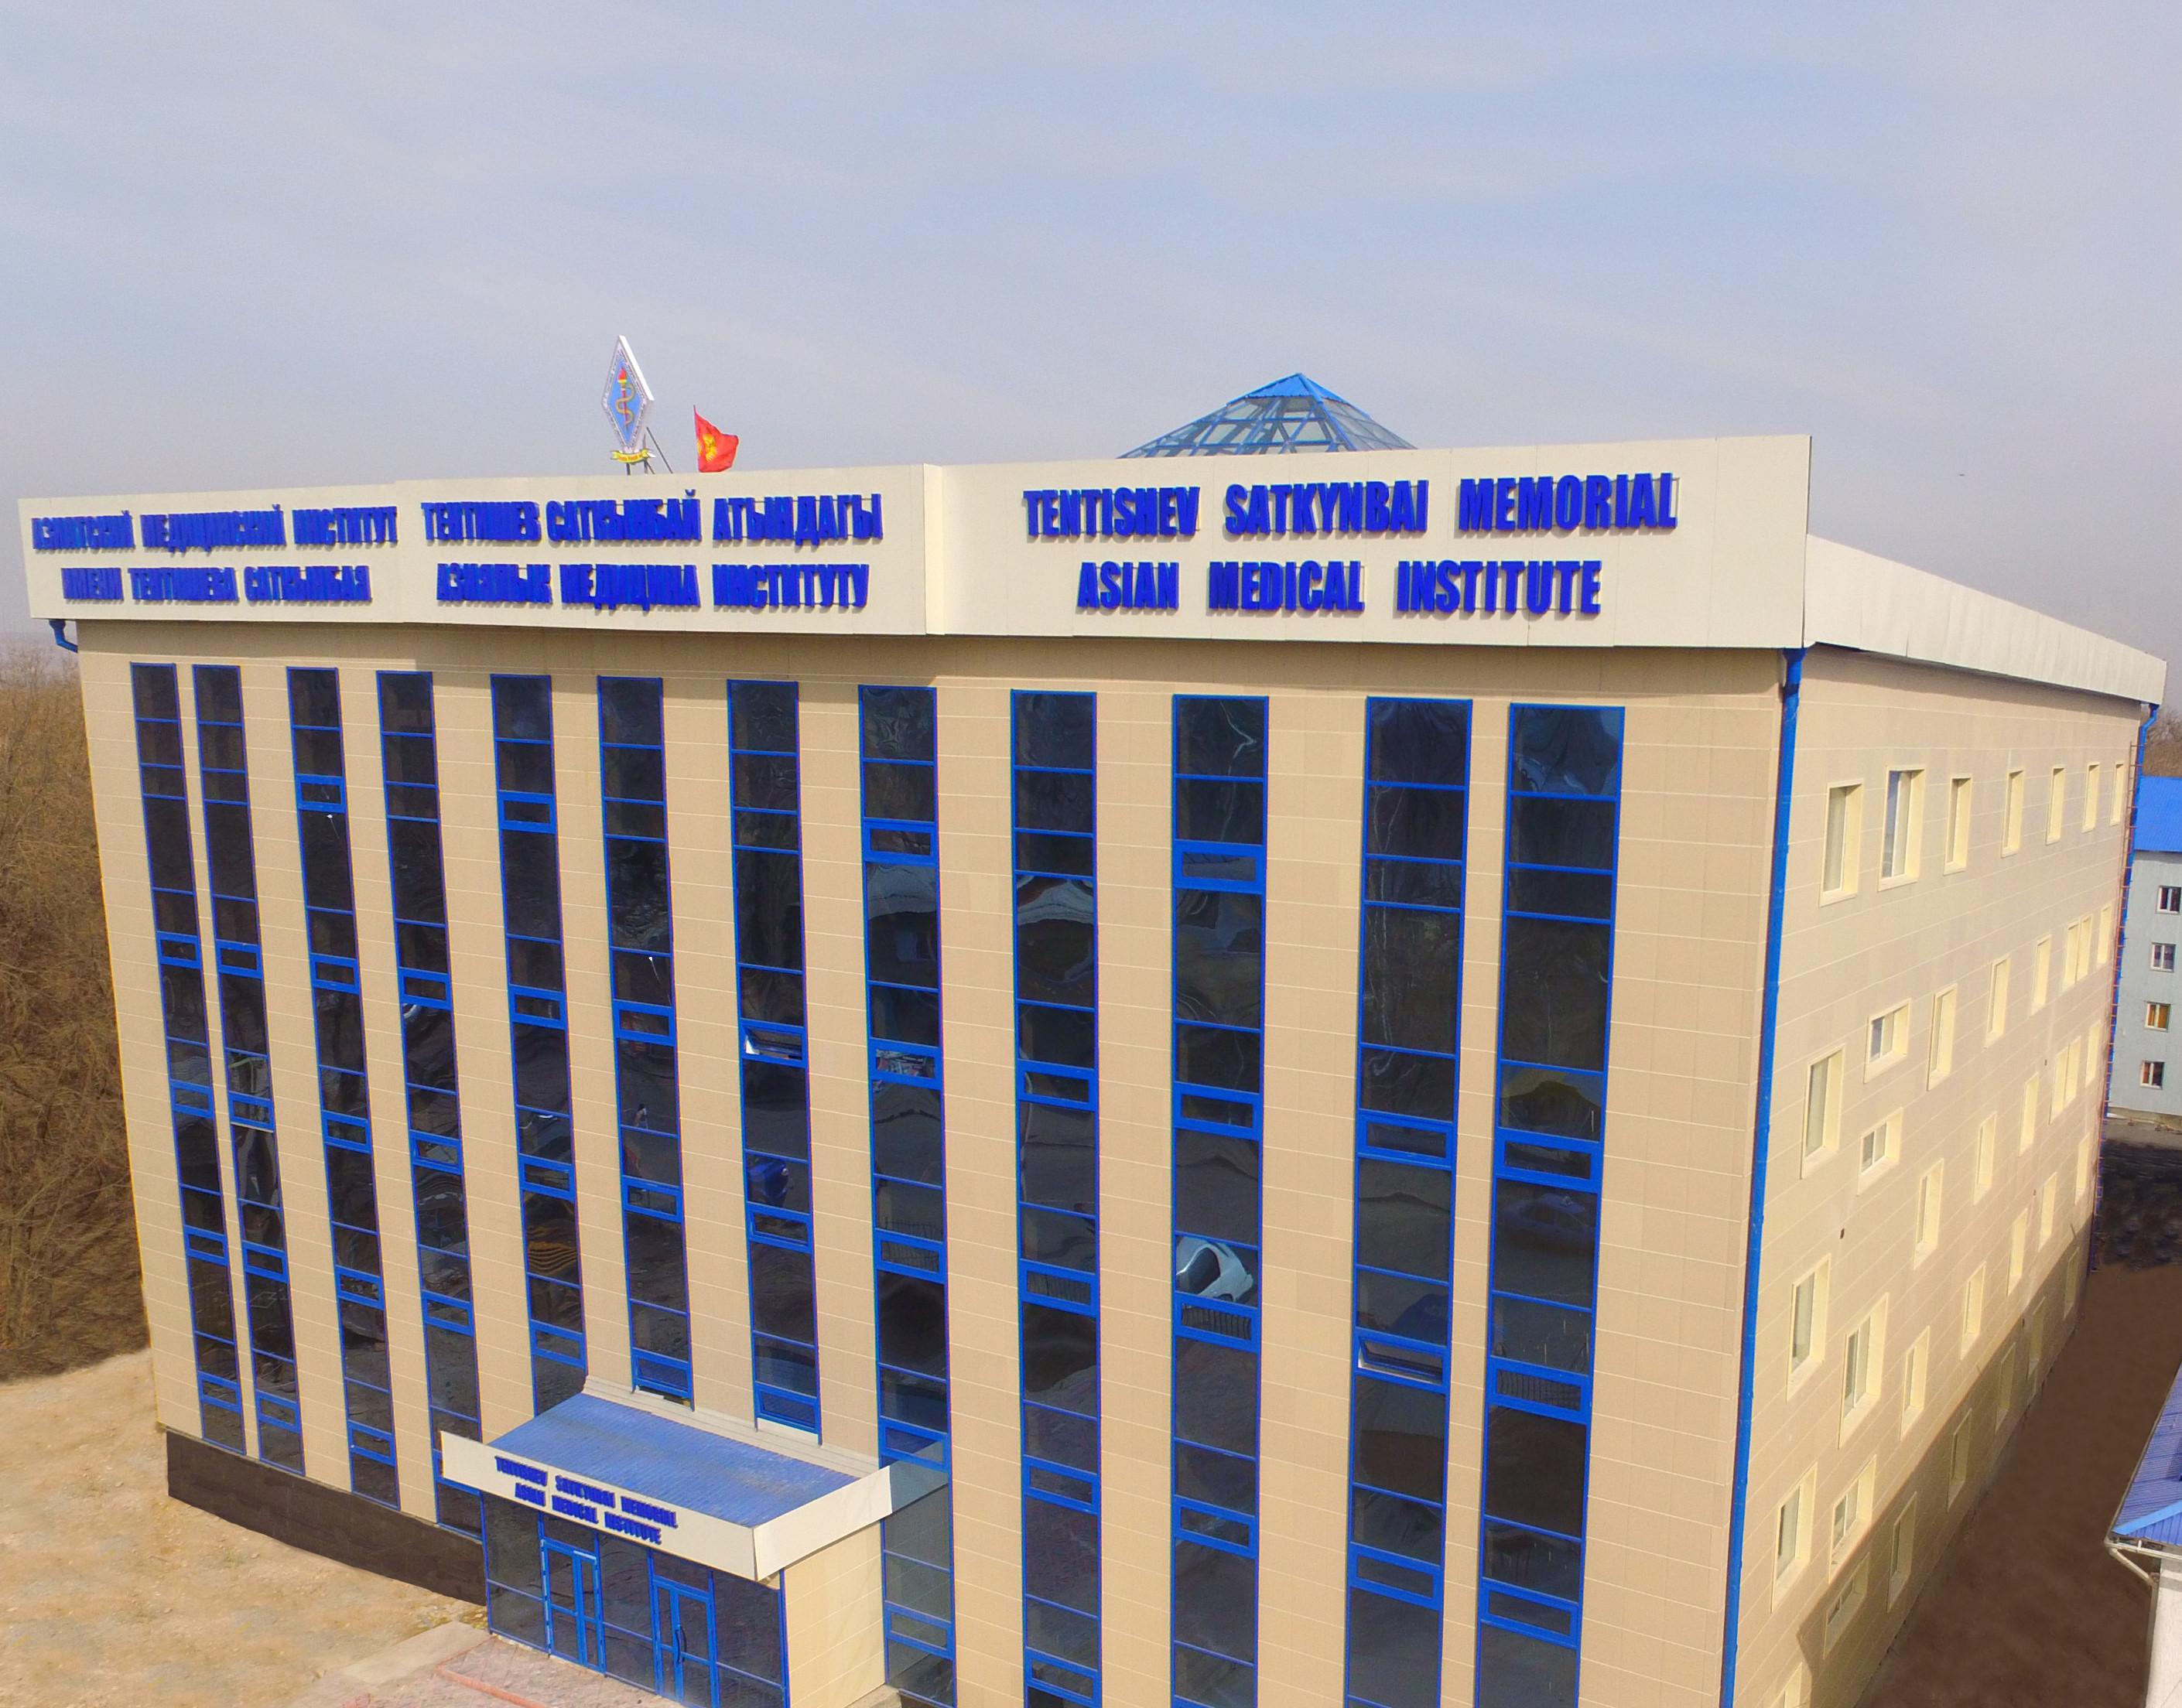 S.Tentishev Asian Medical Institute